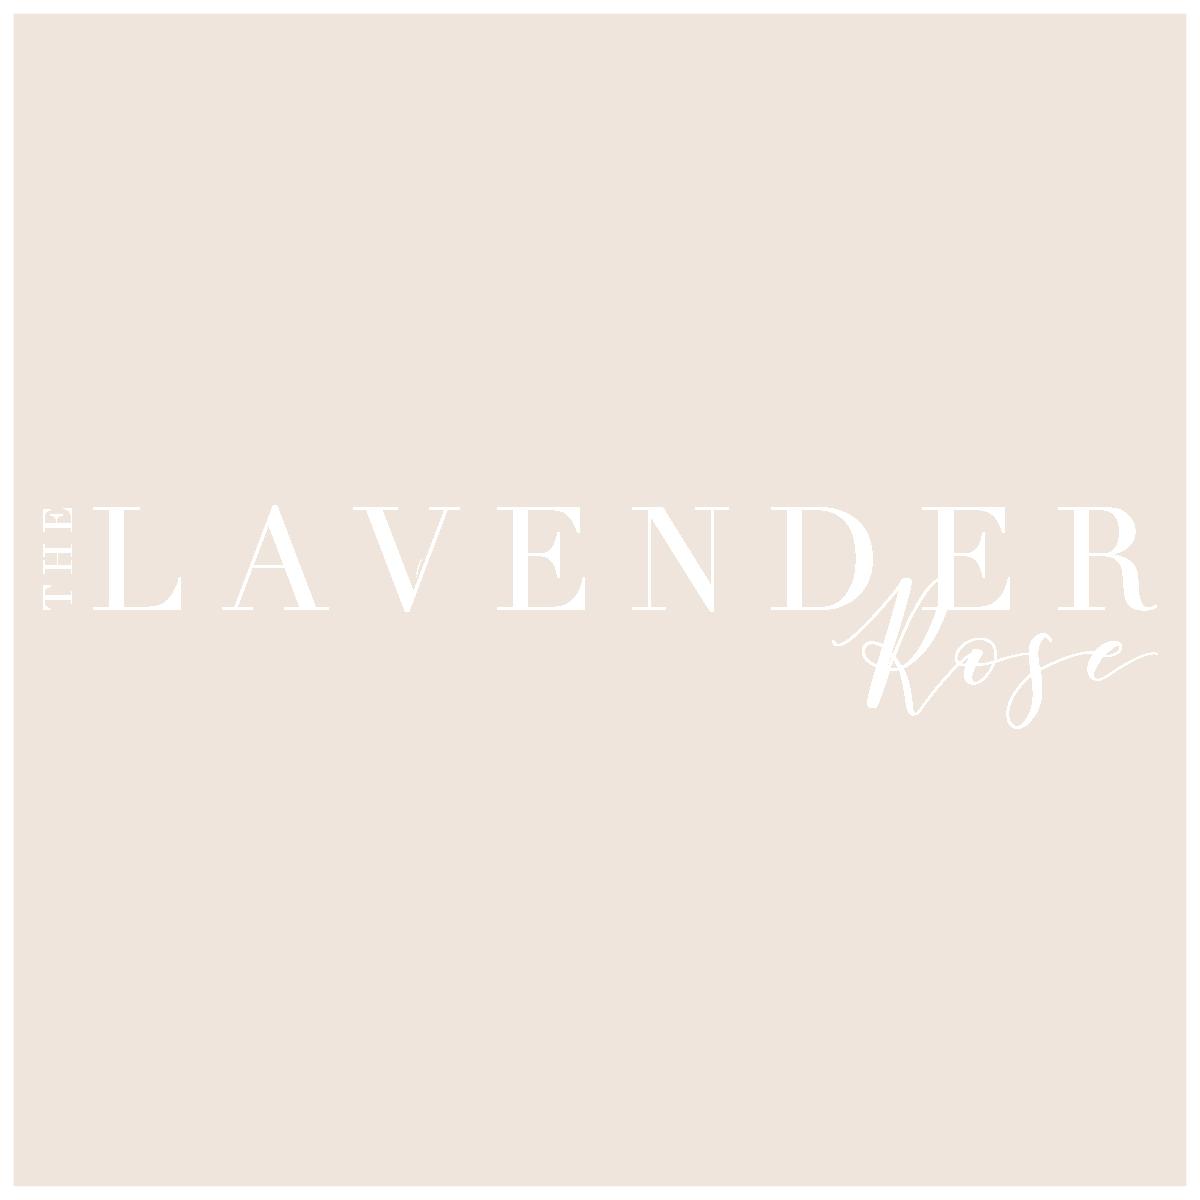 lavenderrose.jpg